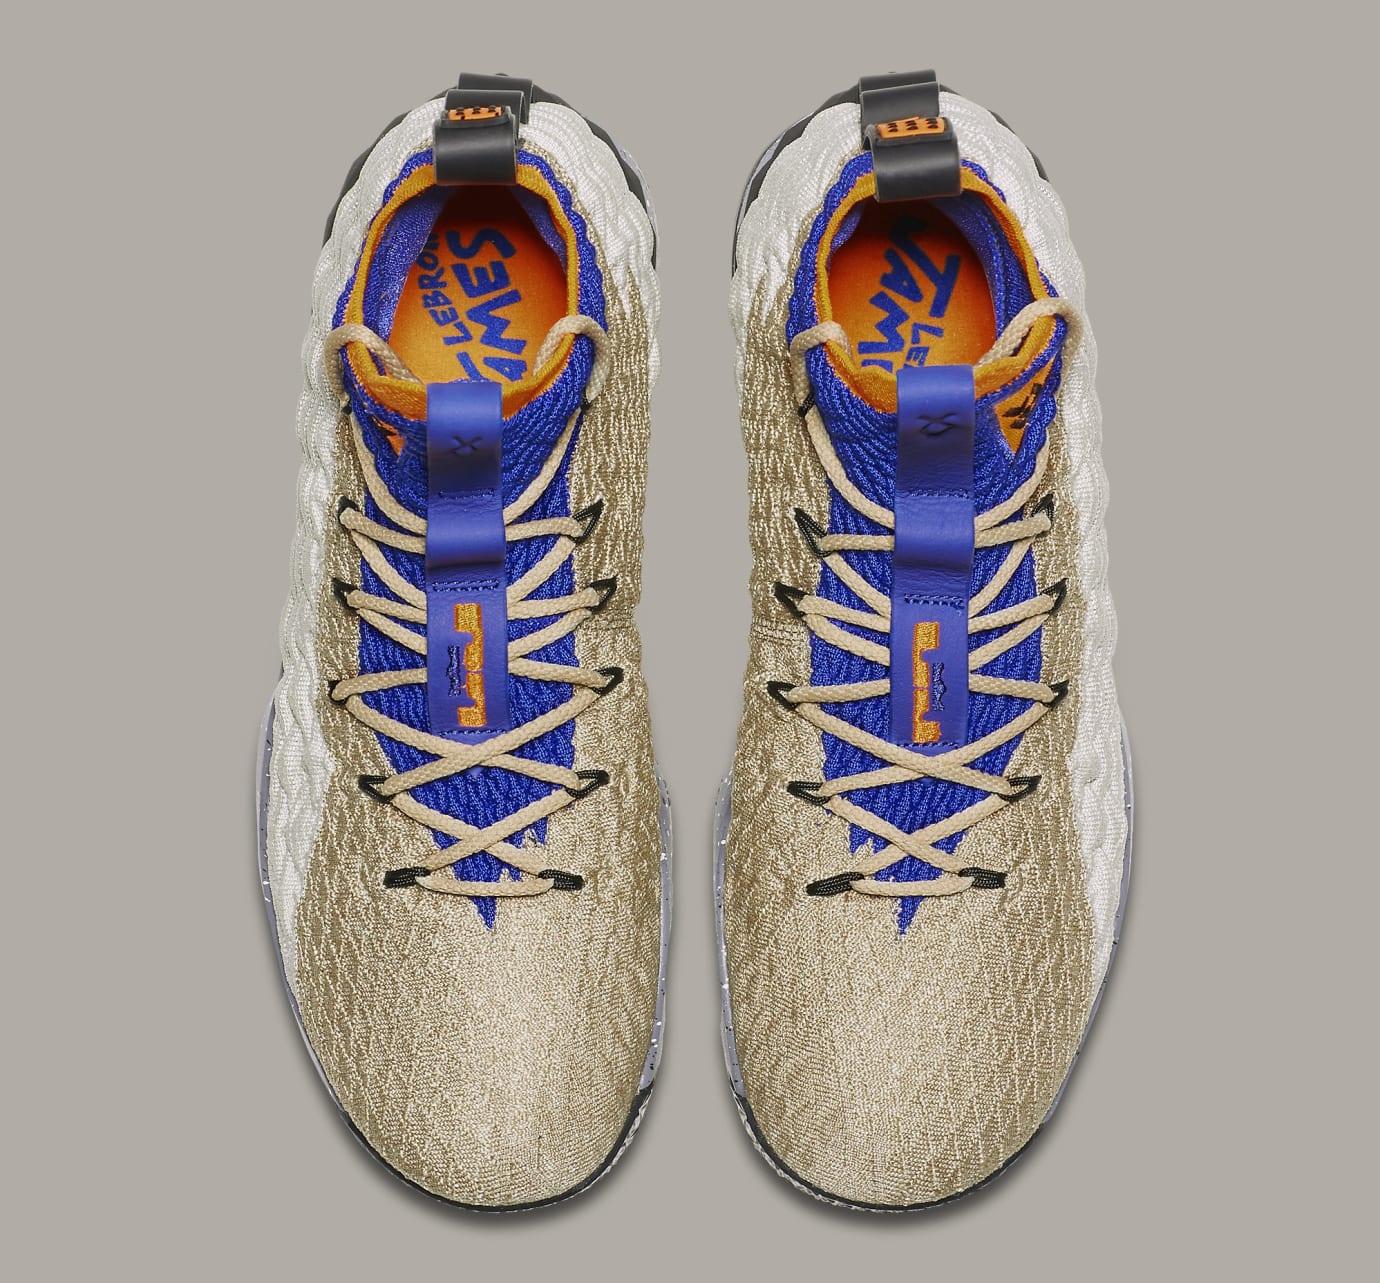 a2b09329f94 Nike LeBron 15 ACG Mowabb Release Date AR4831-900